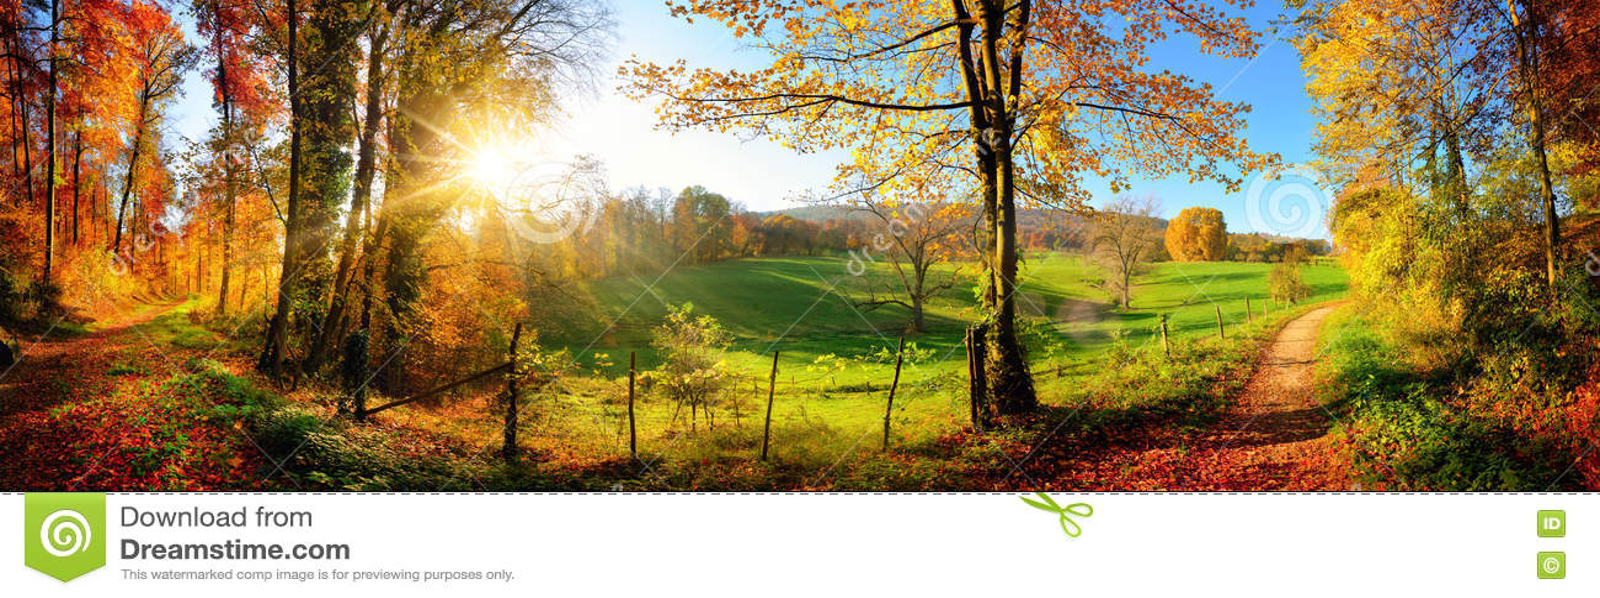 panorama magnifique de paysage en automne image stock image du beau rayons 76383591. Black Bedroom Furniture Sets. Home Design Ideas